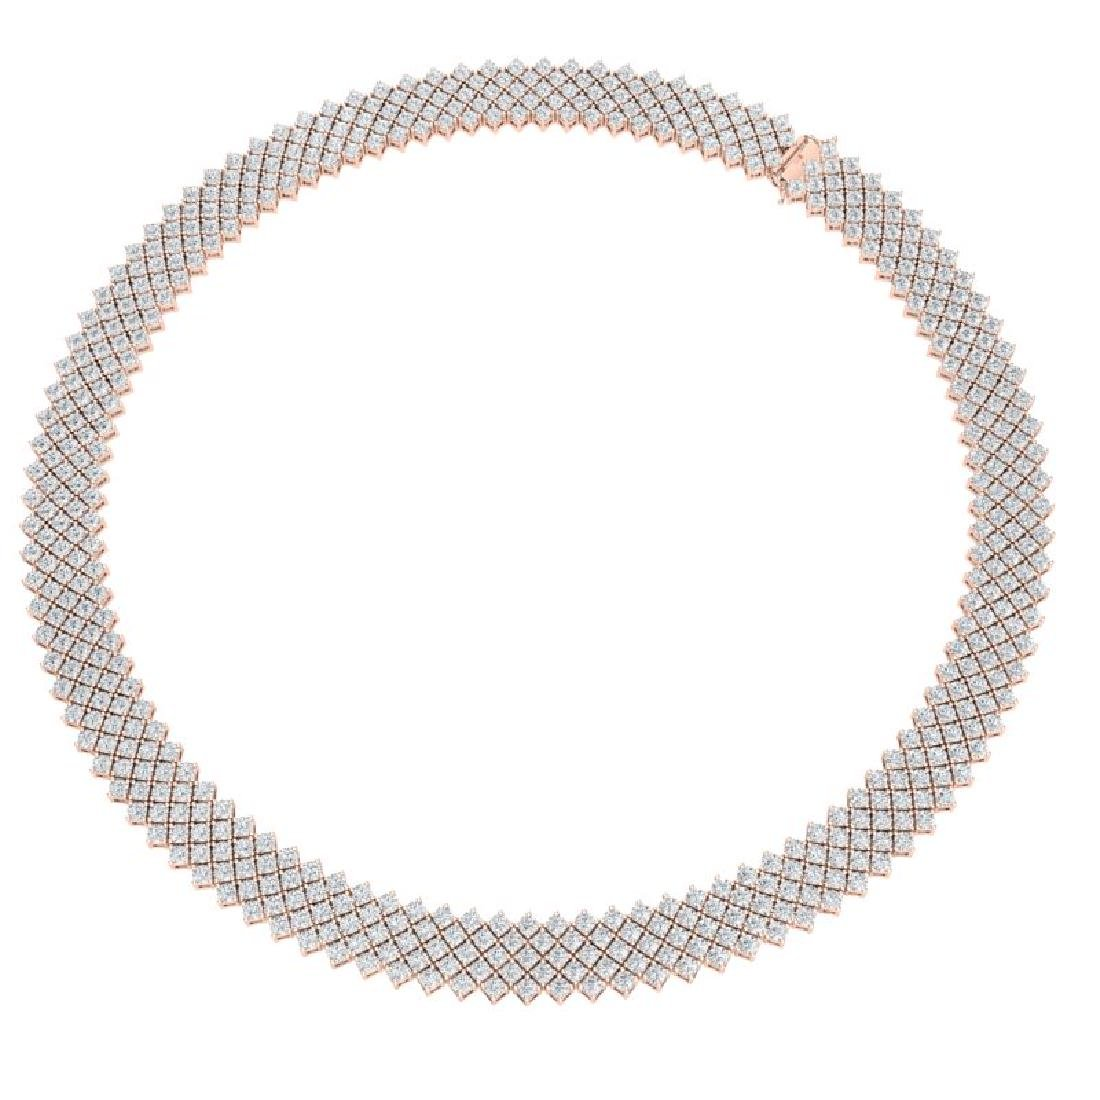 40 CTW Certified VS/SI Diamond Necklace 18K Rose Gold - 3